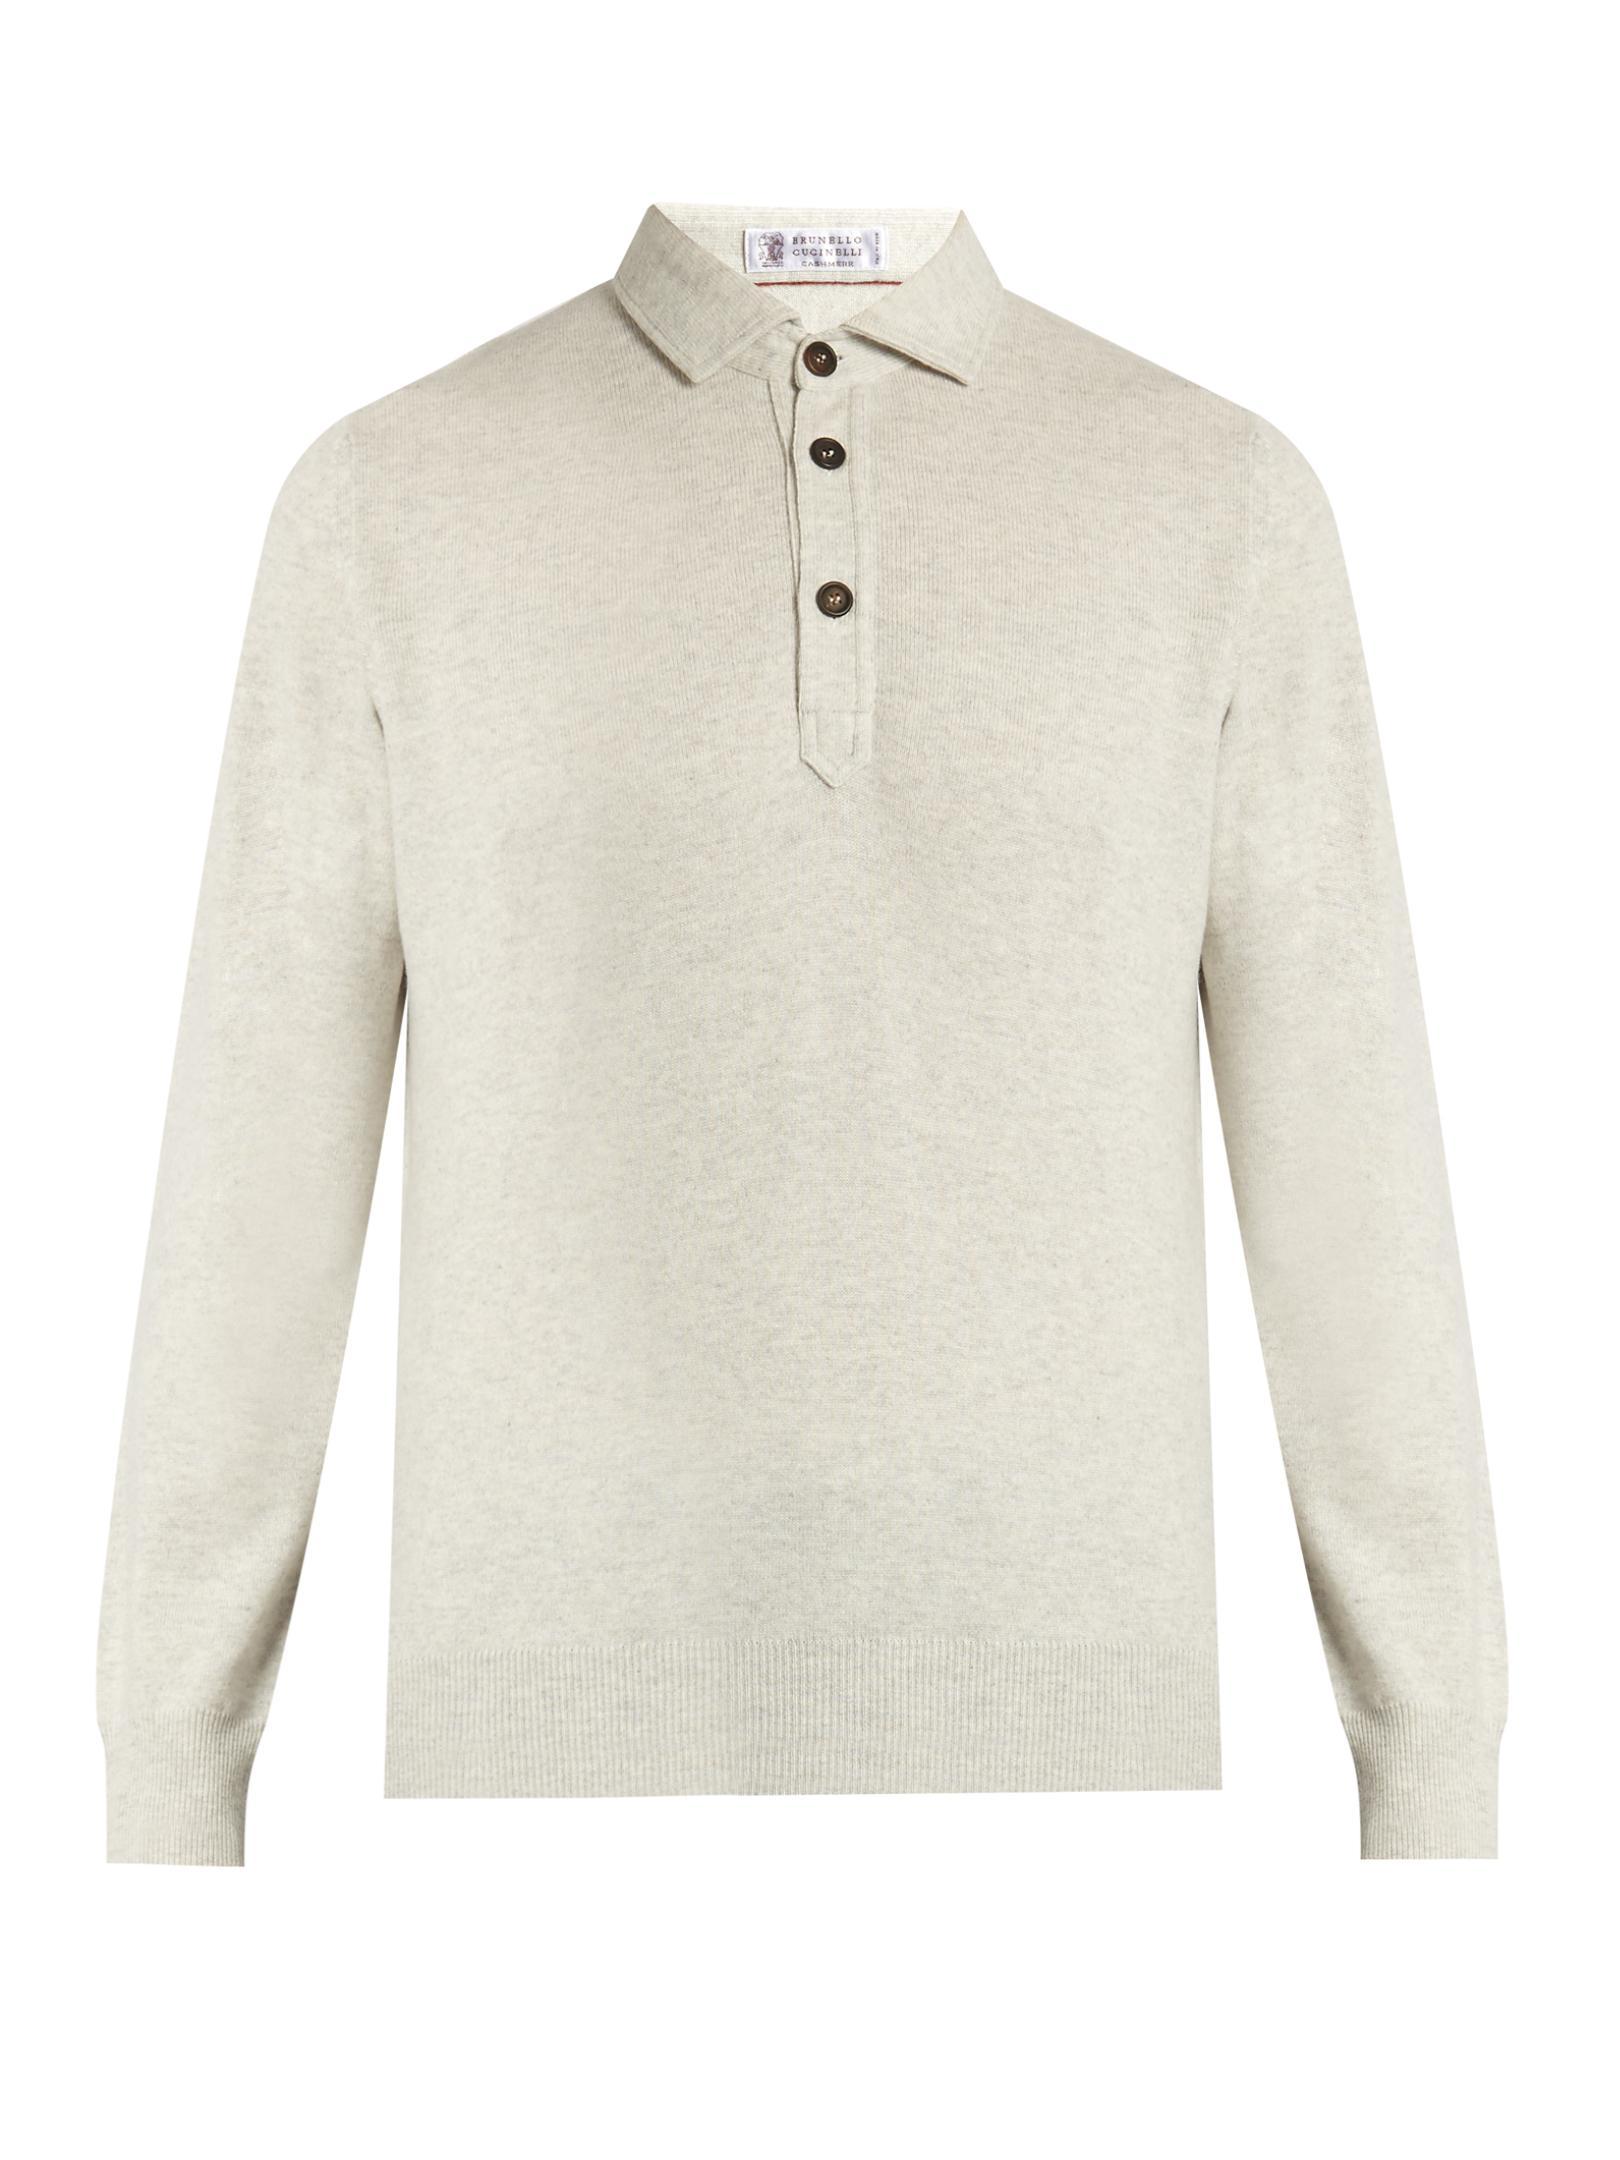 Brunello cucinelli long sleeved wool blend polo shirt in for Long sleeve wool polo shirts